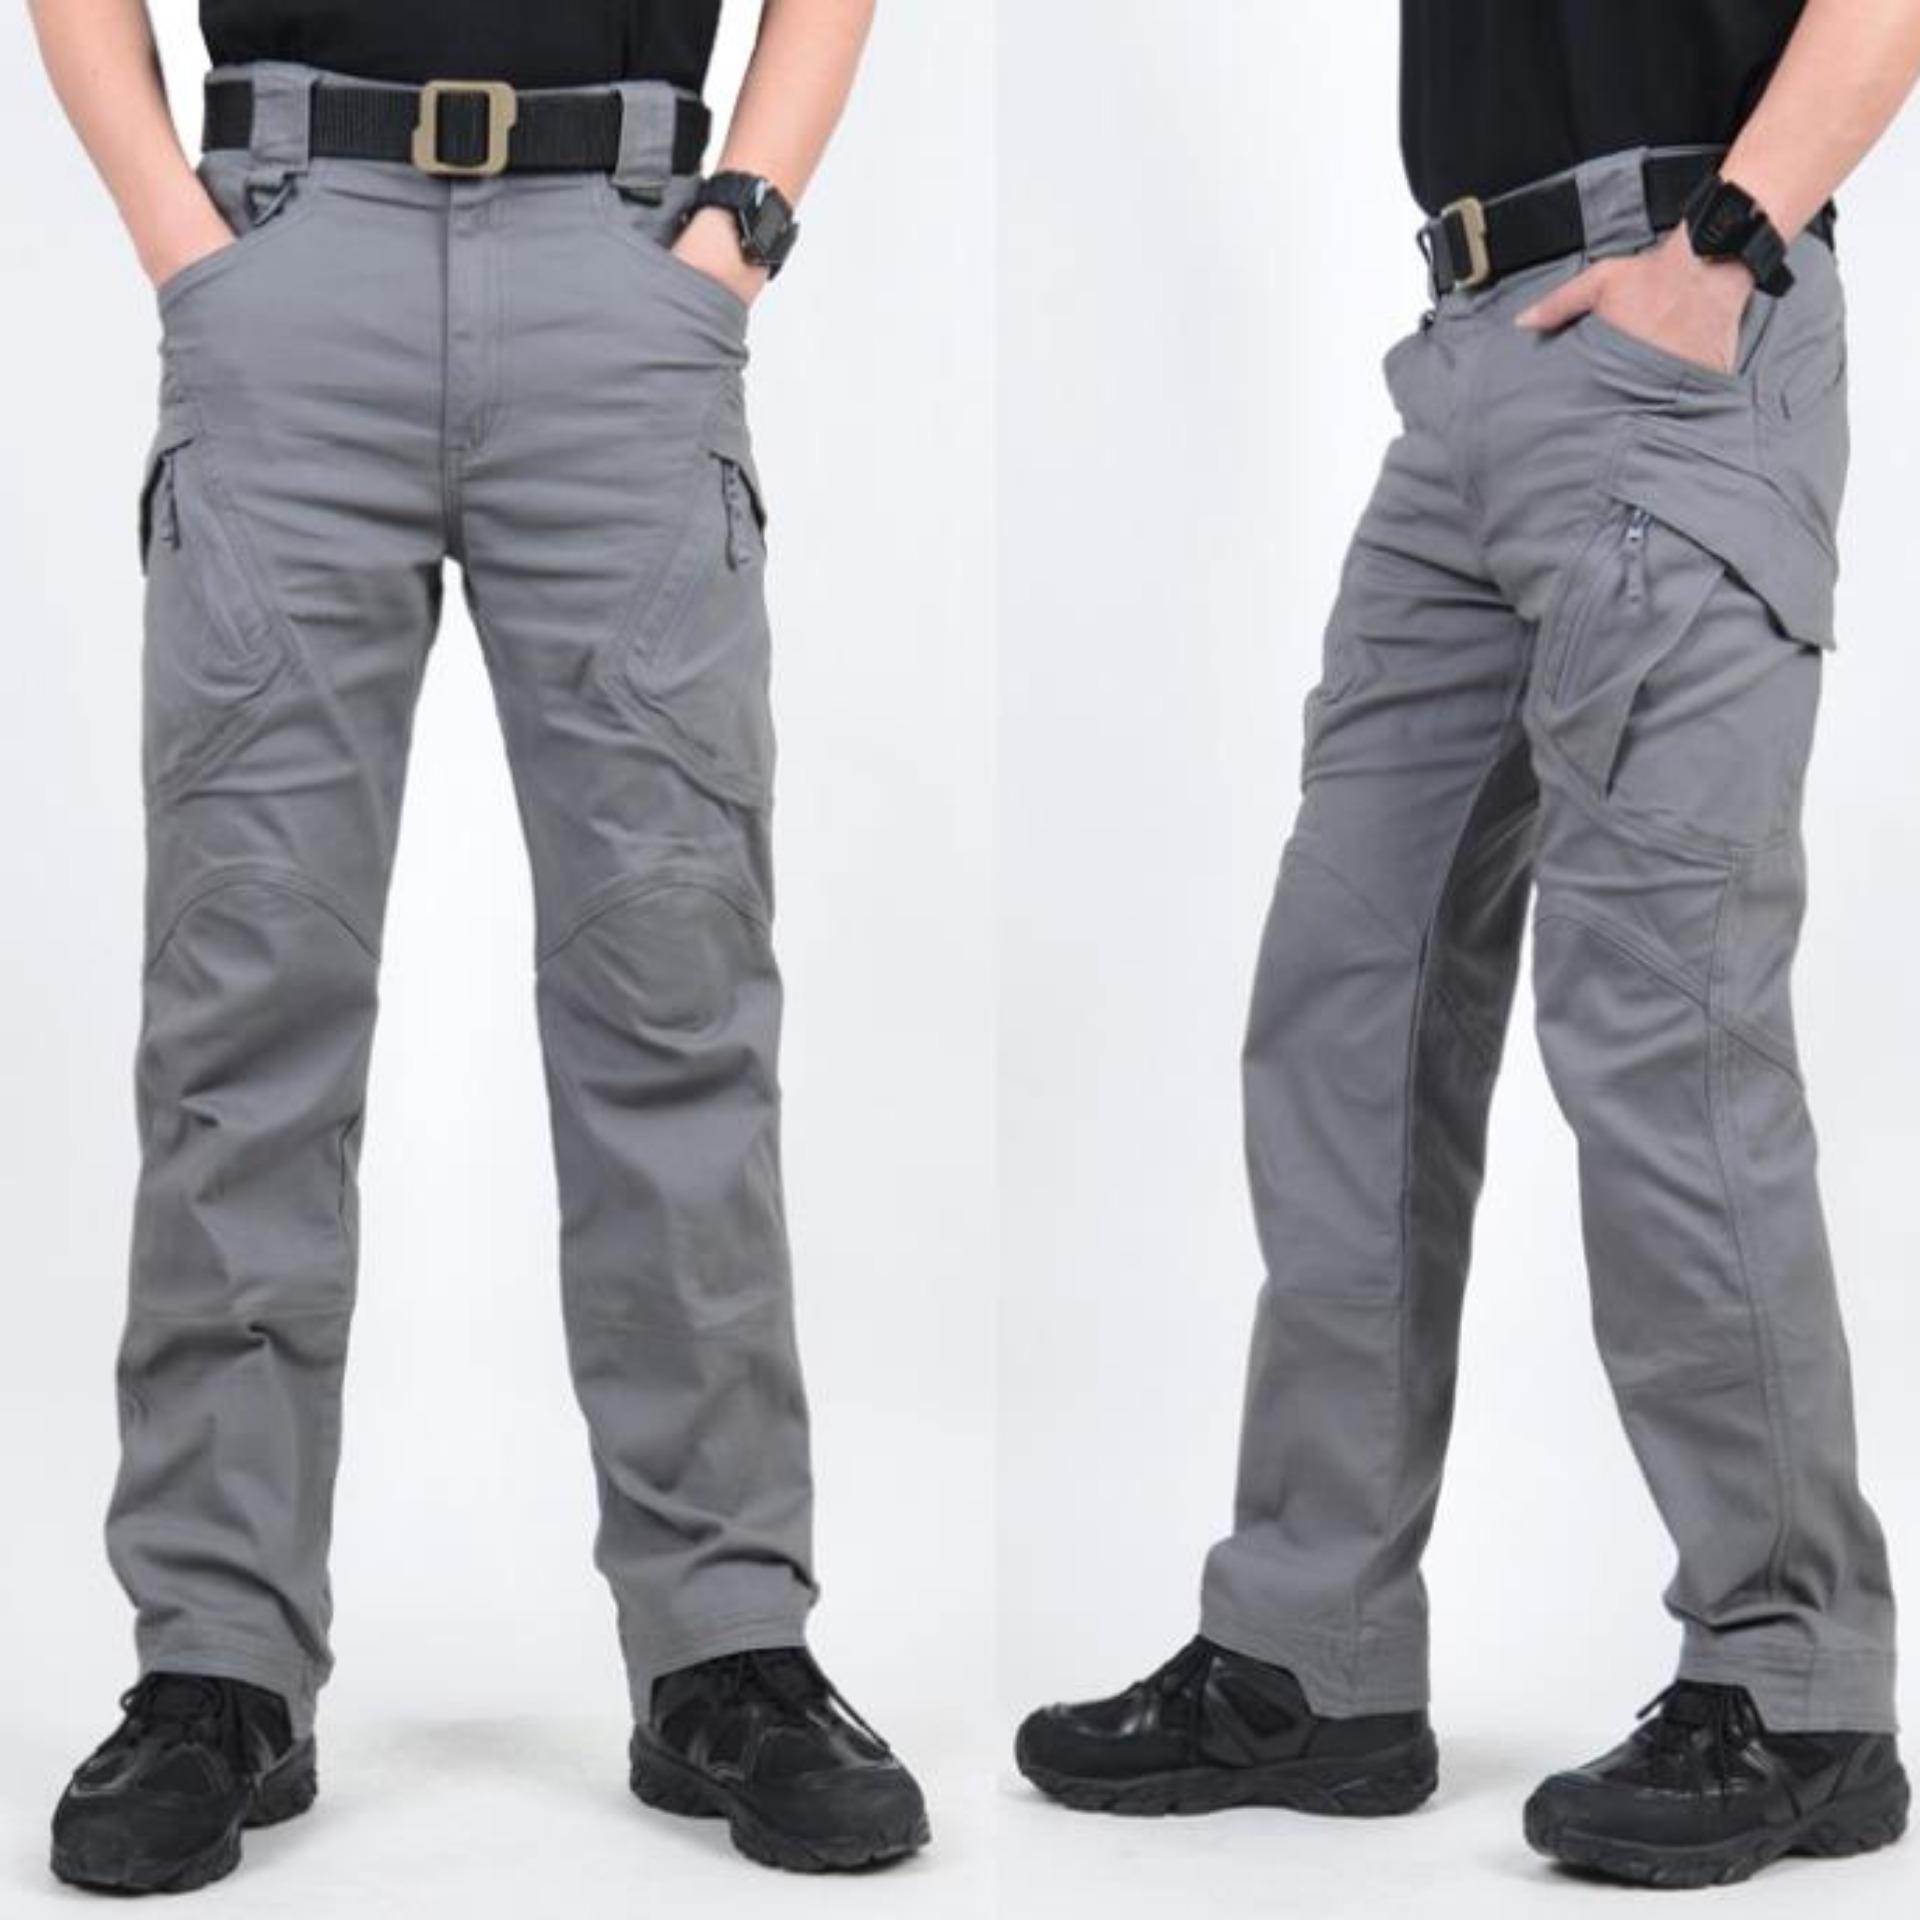 Daftar Harga Celana Panjang Pria Online Murah Eiger Riding Sentra  Pants Black Hitam 32 Devyrama Shop Tactical Outdoor Abu